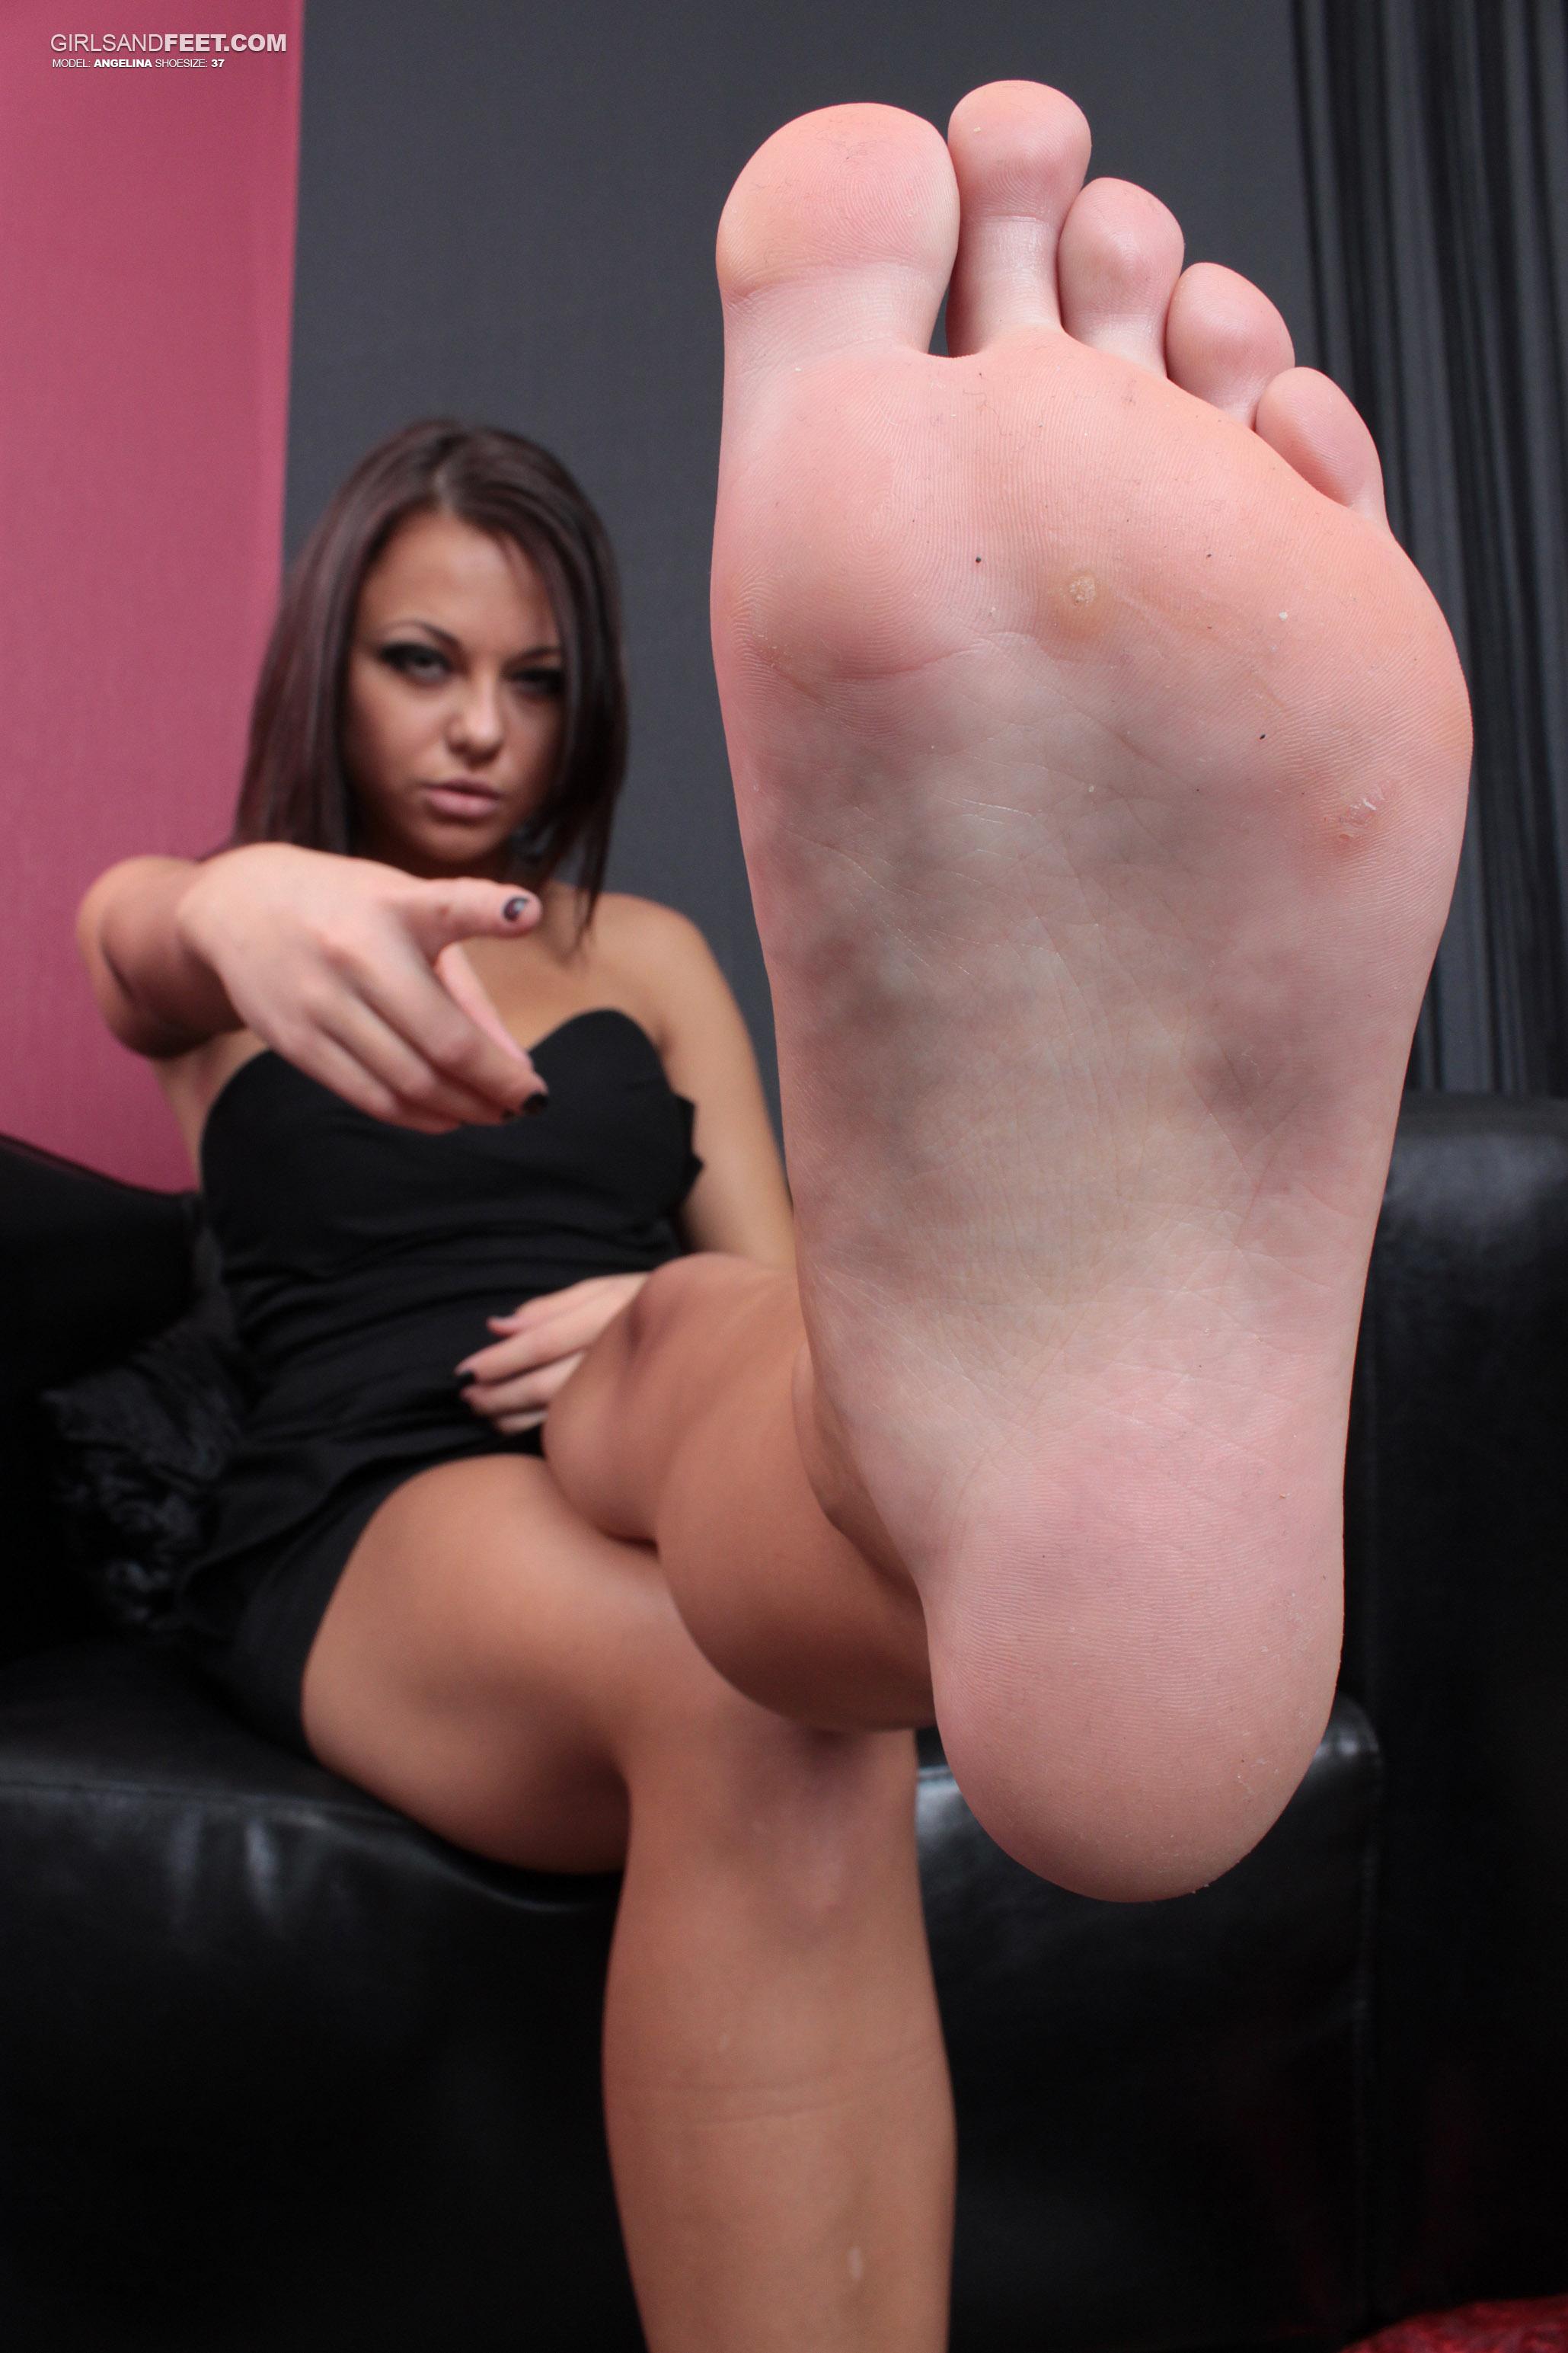 Girls foot videos